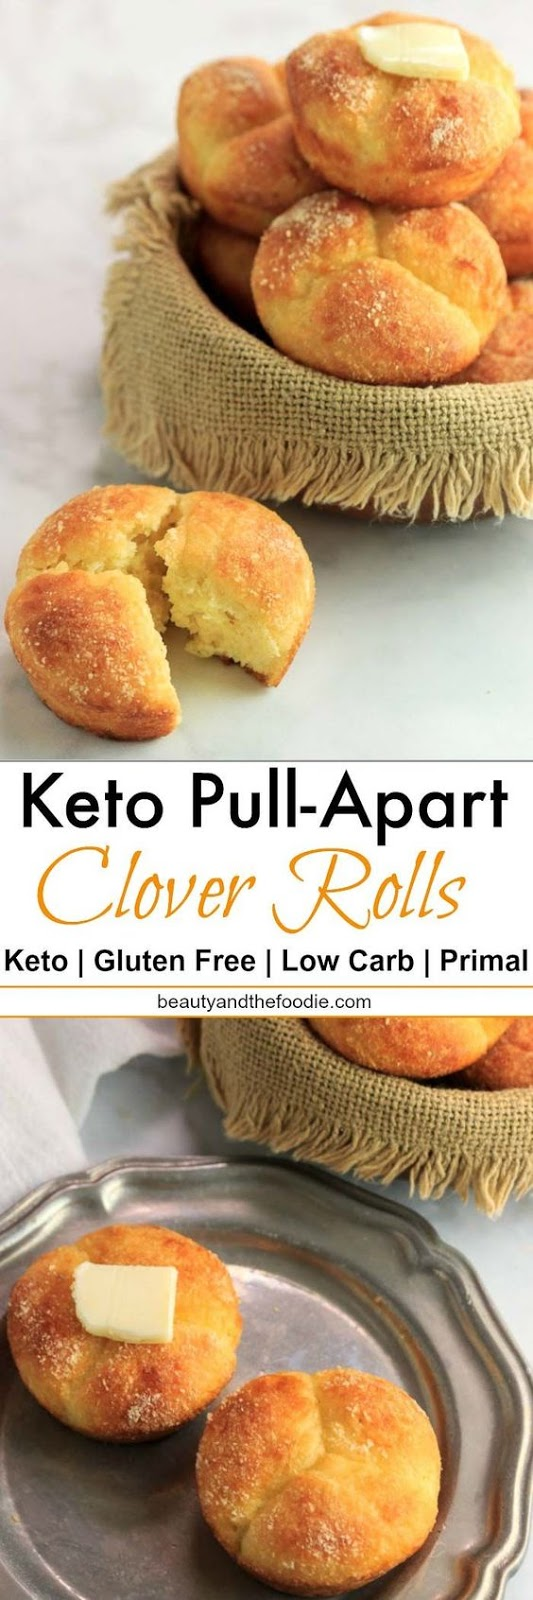 KETO PULL APART CLOVER ROLLS-